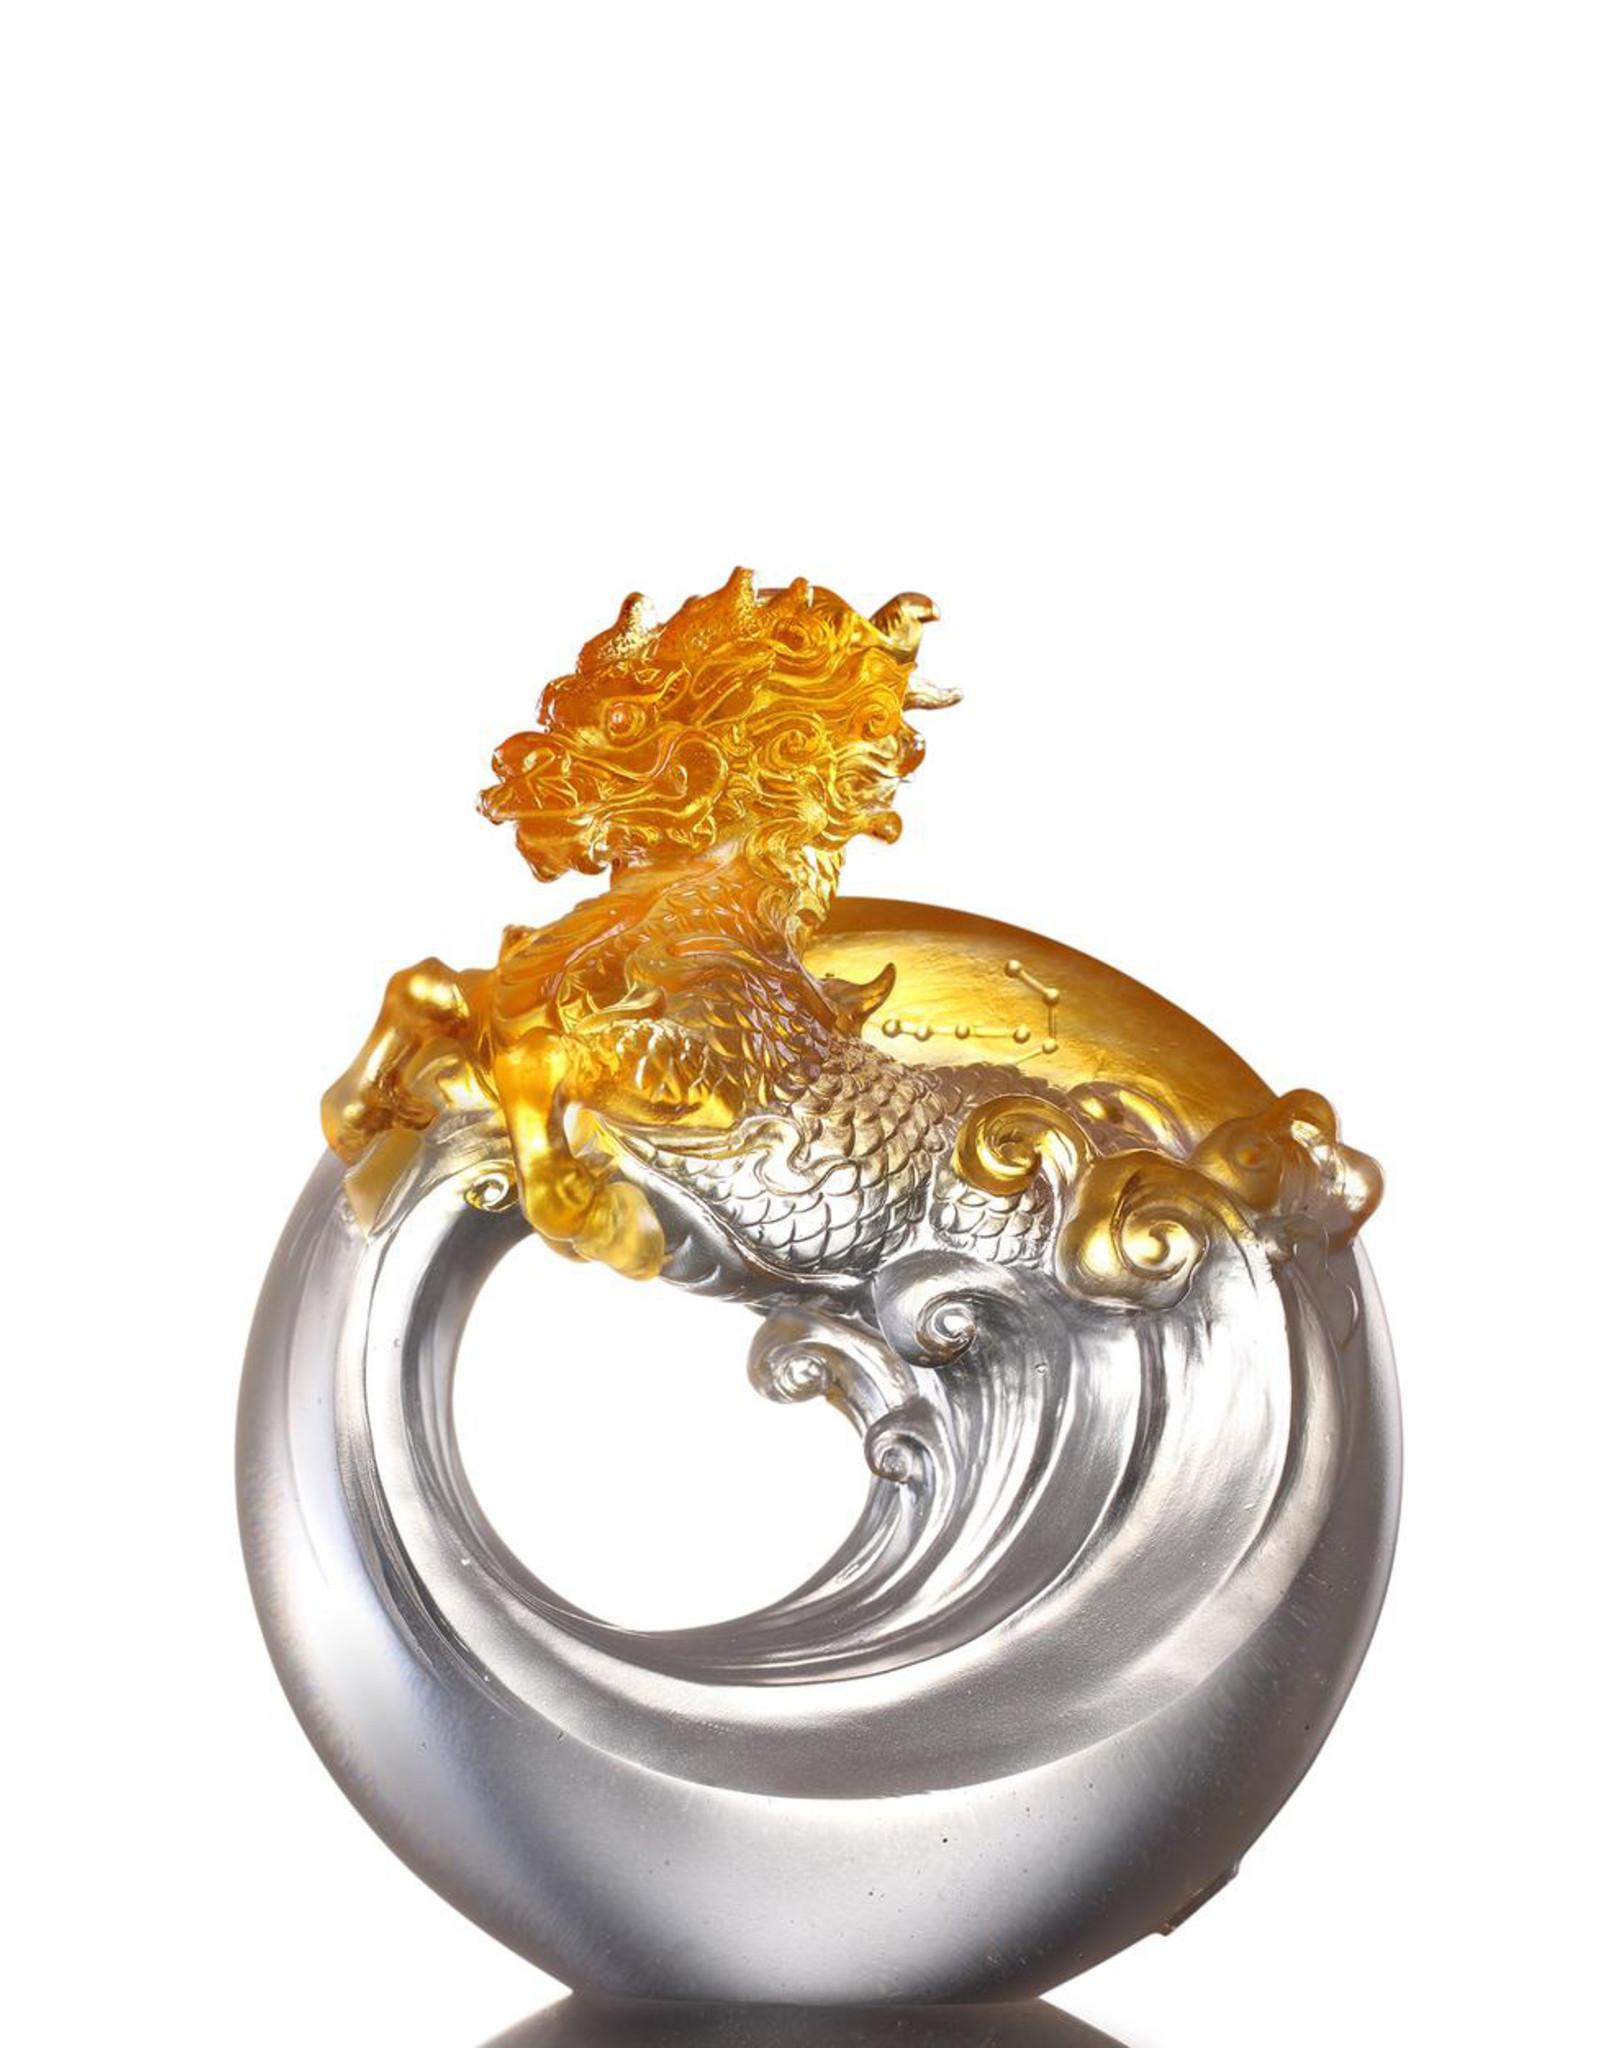 LIULI Crystal Art Crystal Mythical Creatures, Set of 5, Dragon, Vermillion Bird, Qilin, Tiger, Tortoise (Light set)